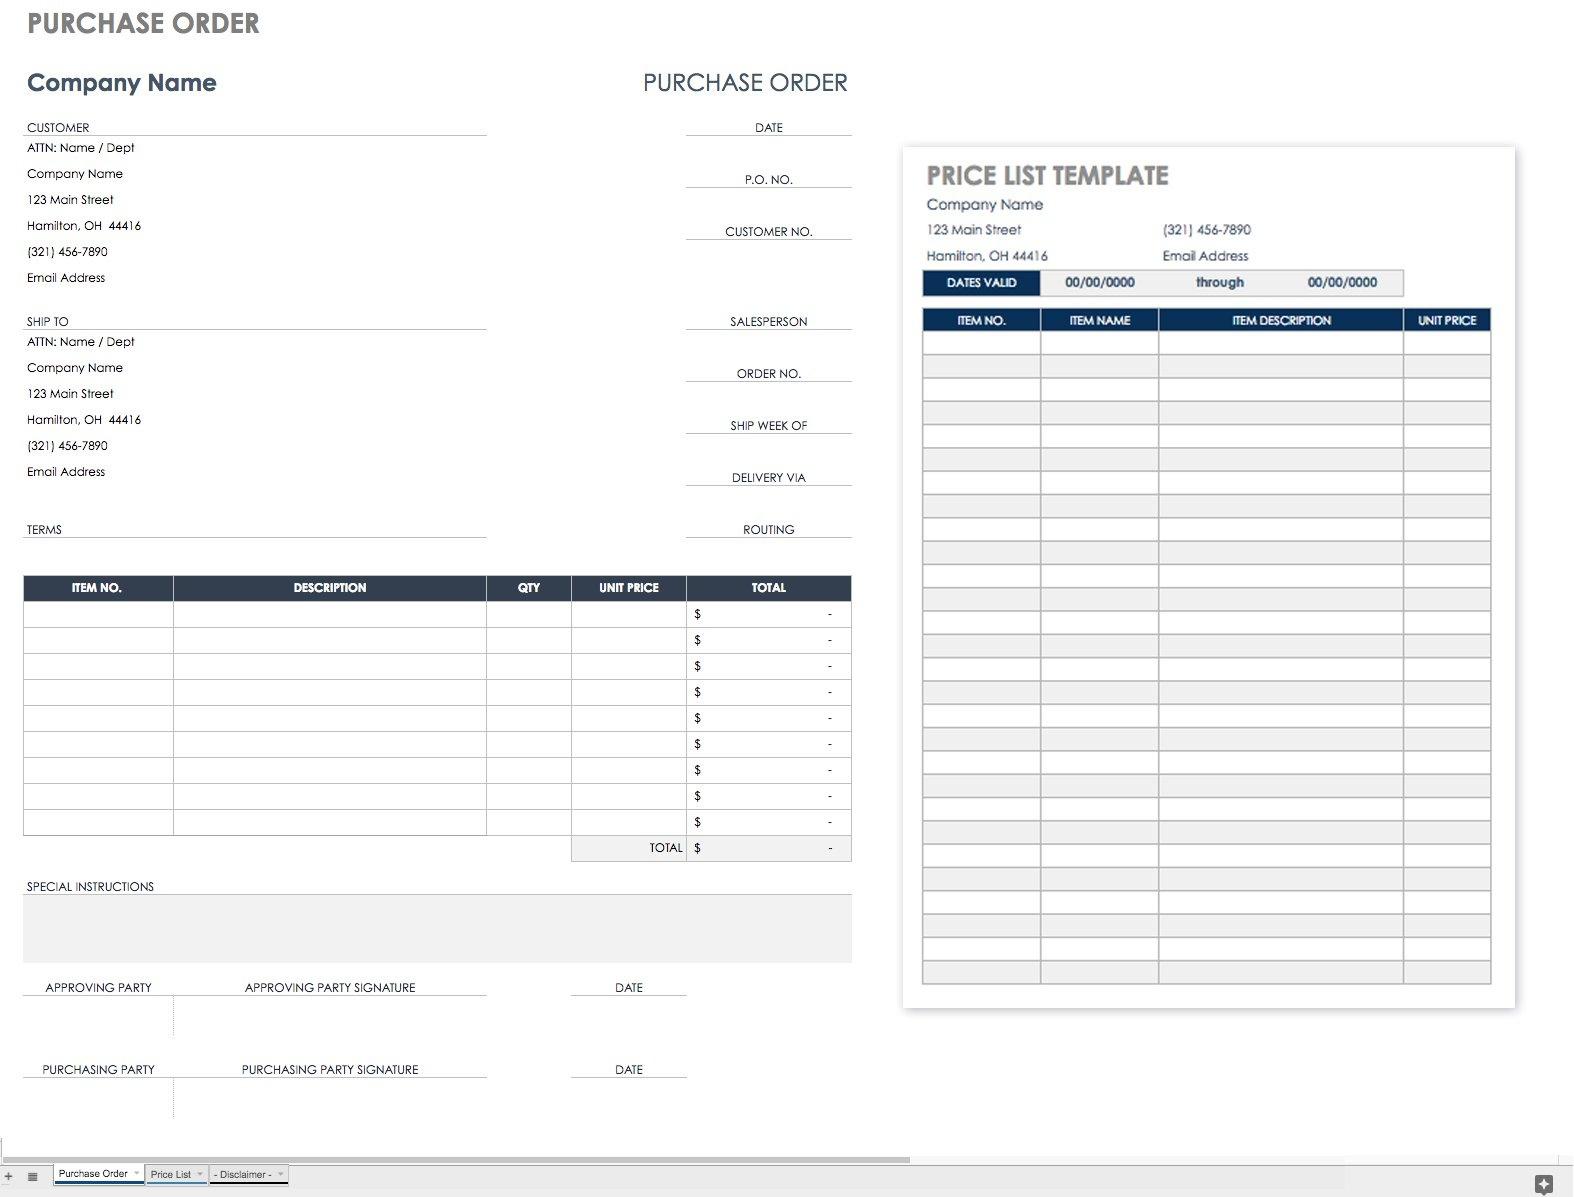 Free Purchase Order Templates | Smartsheet - Free Printable Work Order Template